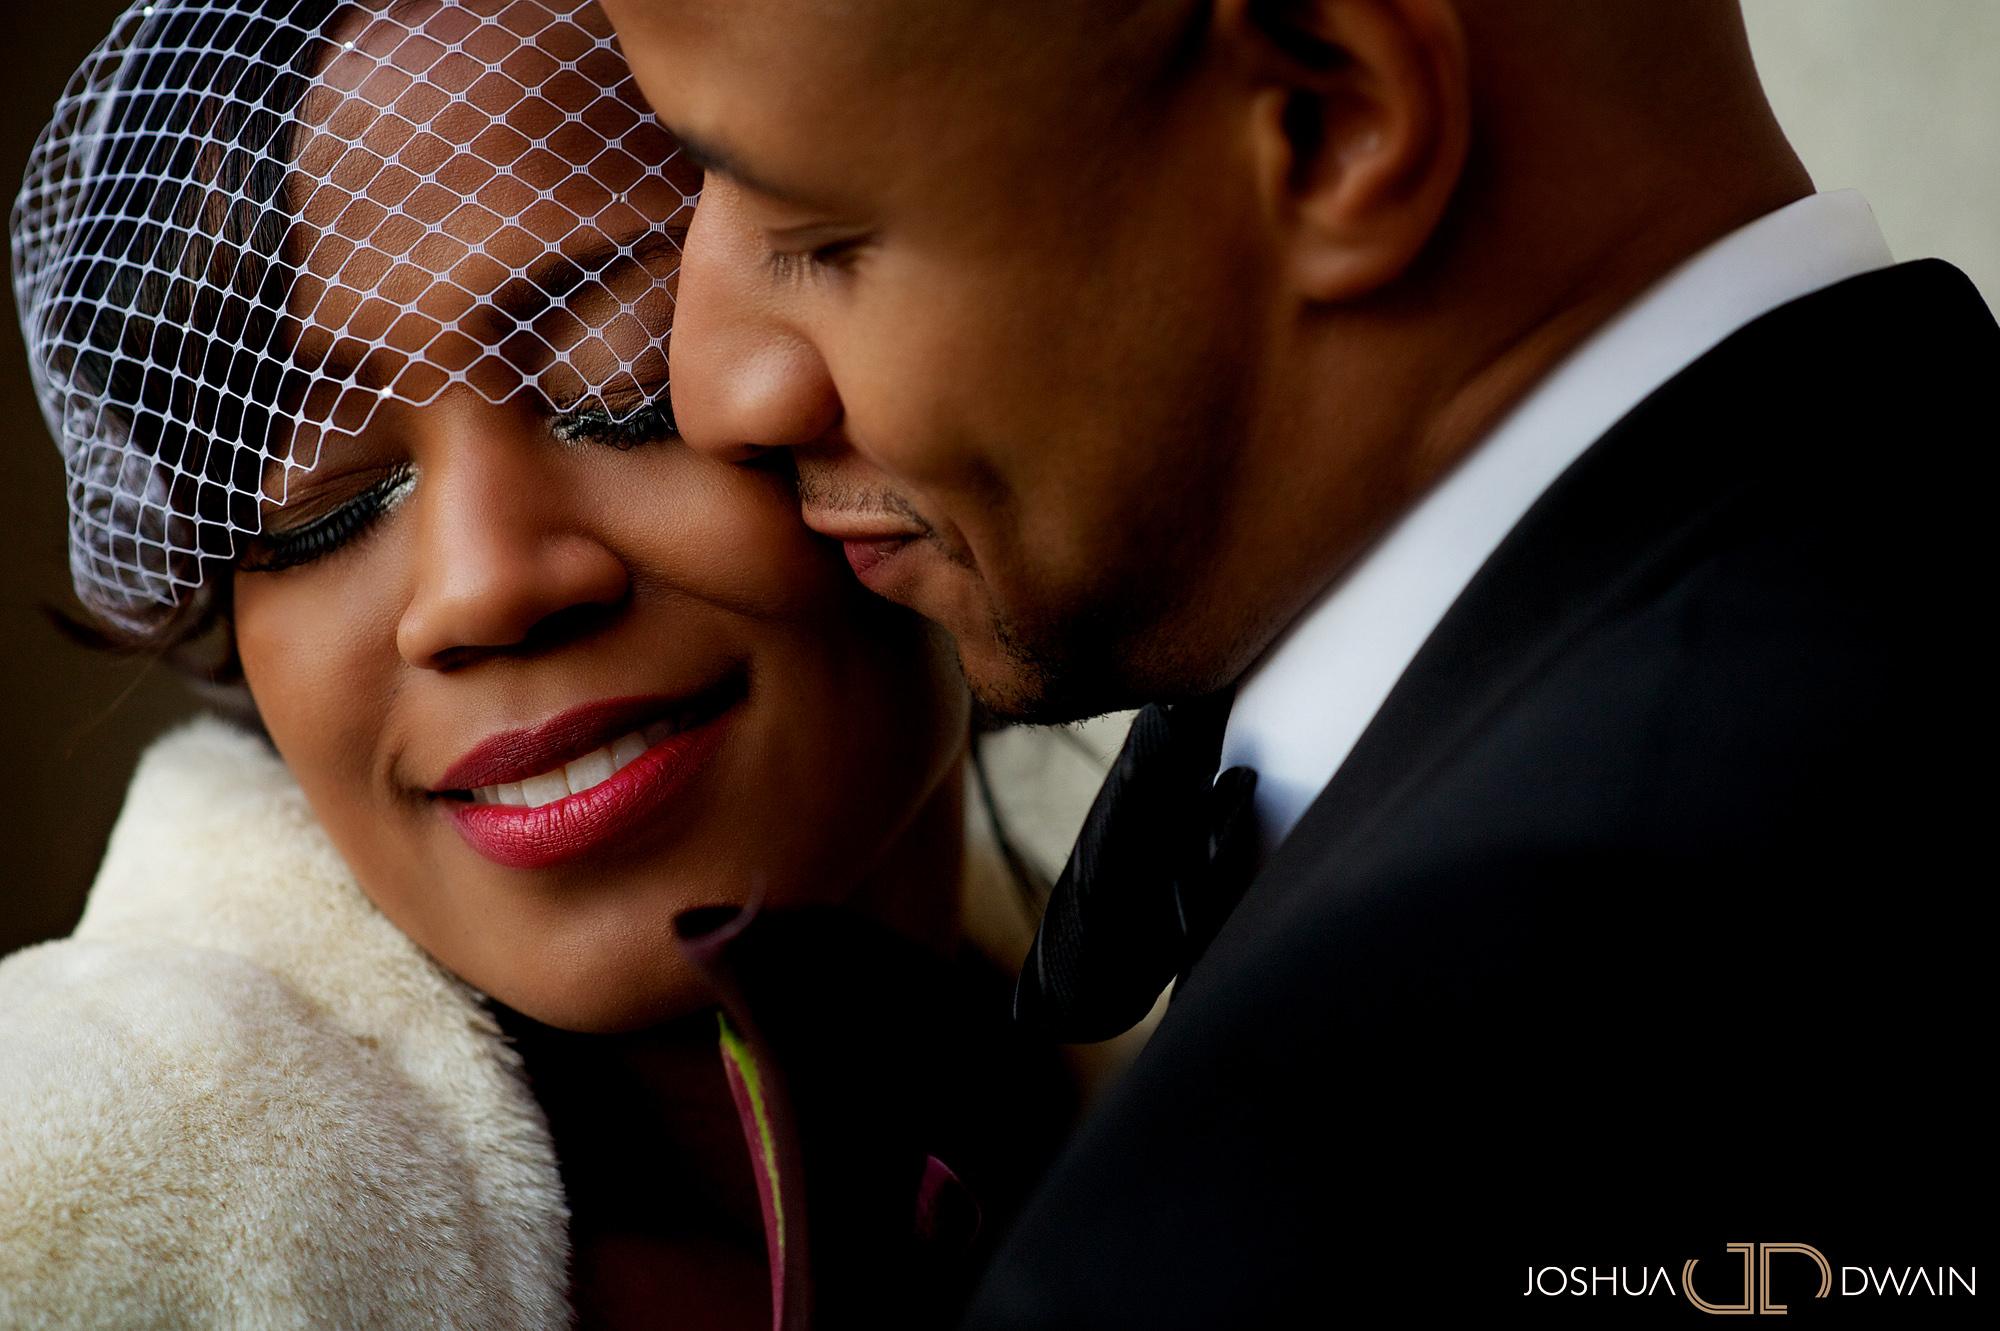 joshua-dwain-weddings-gallery-best-wedding-photographers-us-044